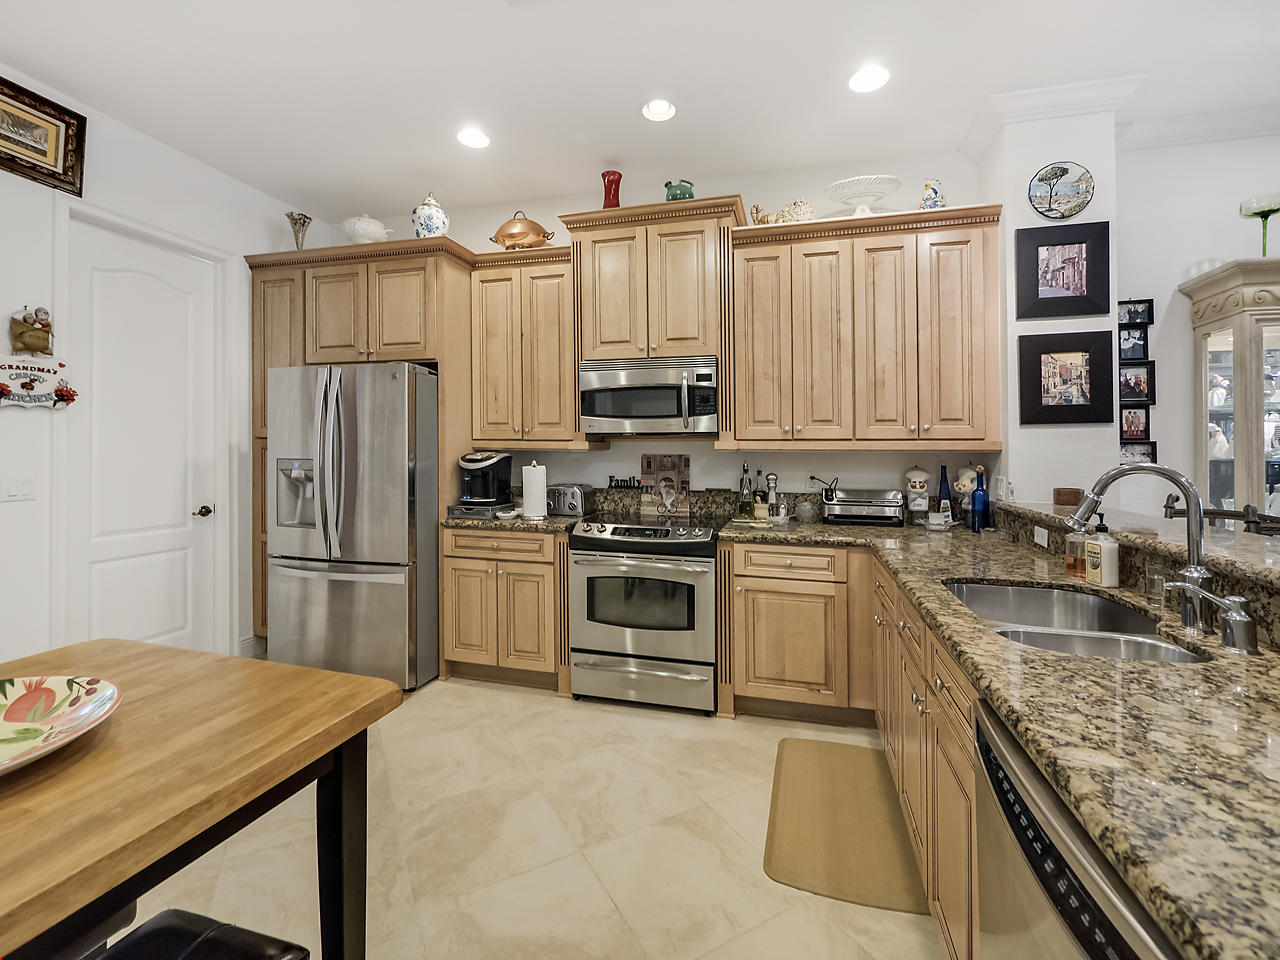 Home for sale in Cielo Palm Beach Gardens Florida